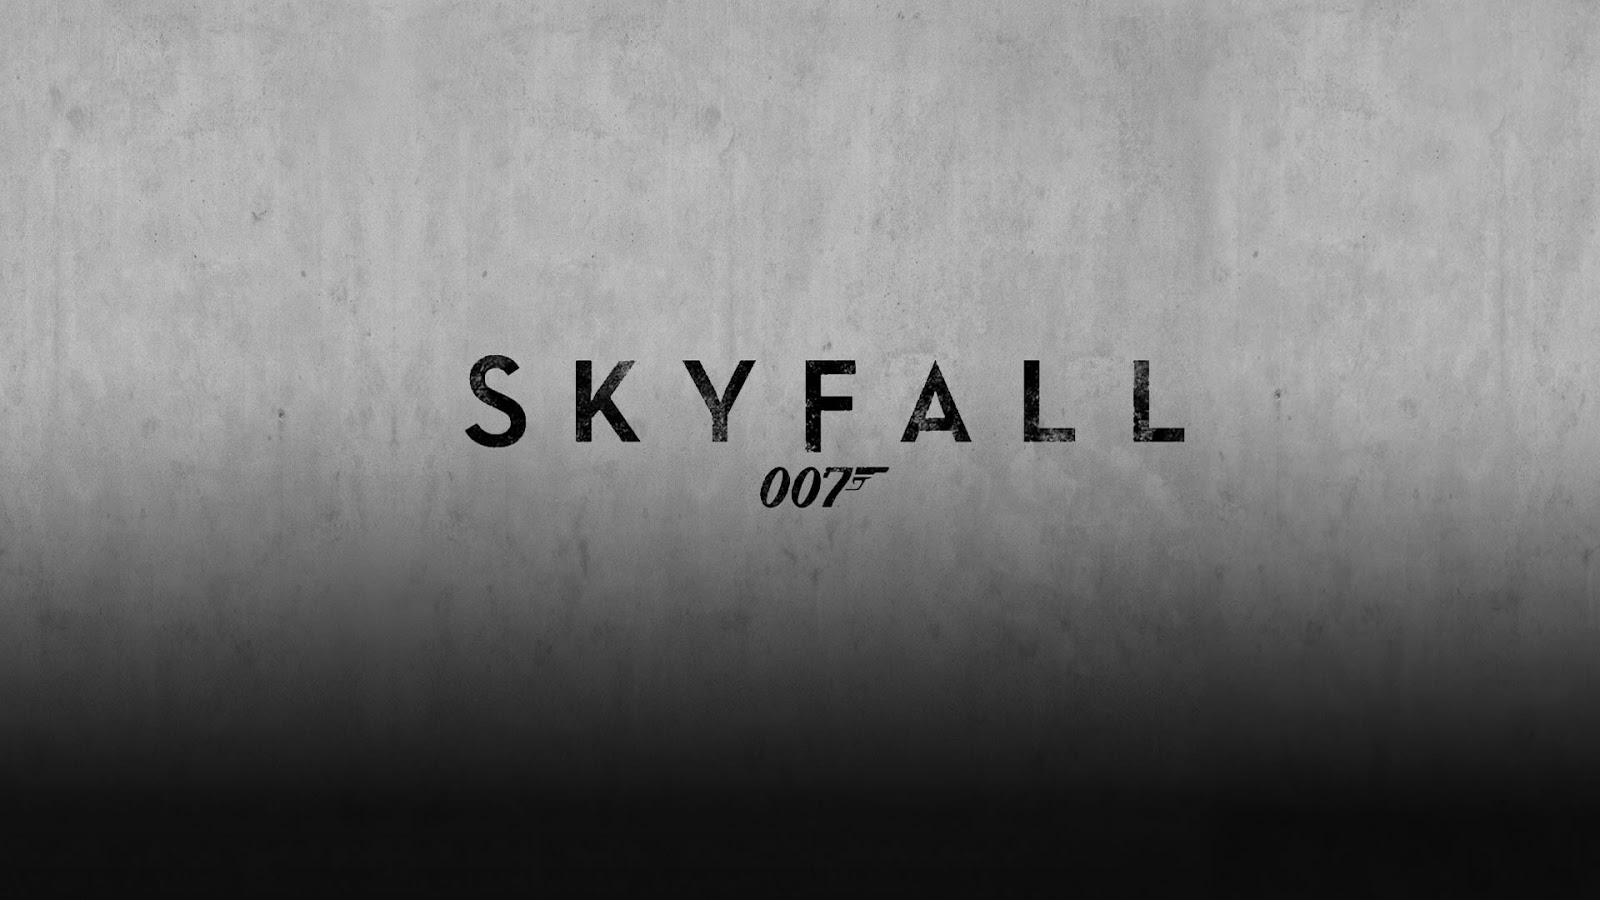 http://4.bp.blogspot.com/-iSfOSCN_KPk/UKYdmQuNGAI/AAAAAAAAAy0/AYXZ5lbqaGQ/s1600/James-Bond-007+Skyfall+wallpaper07.jpg